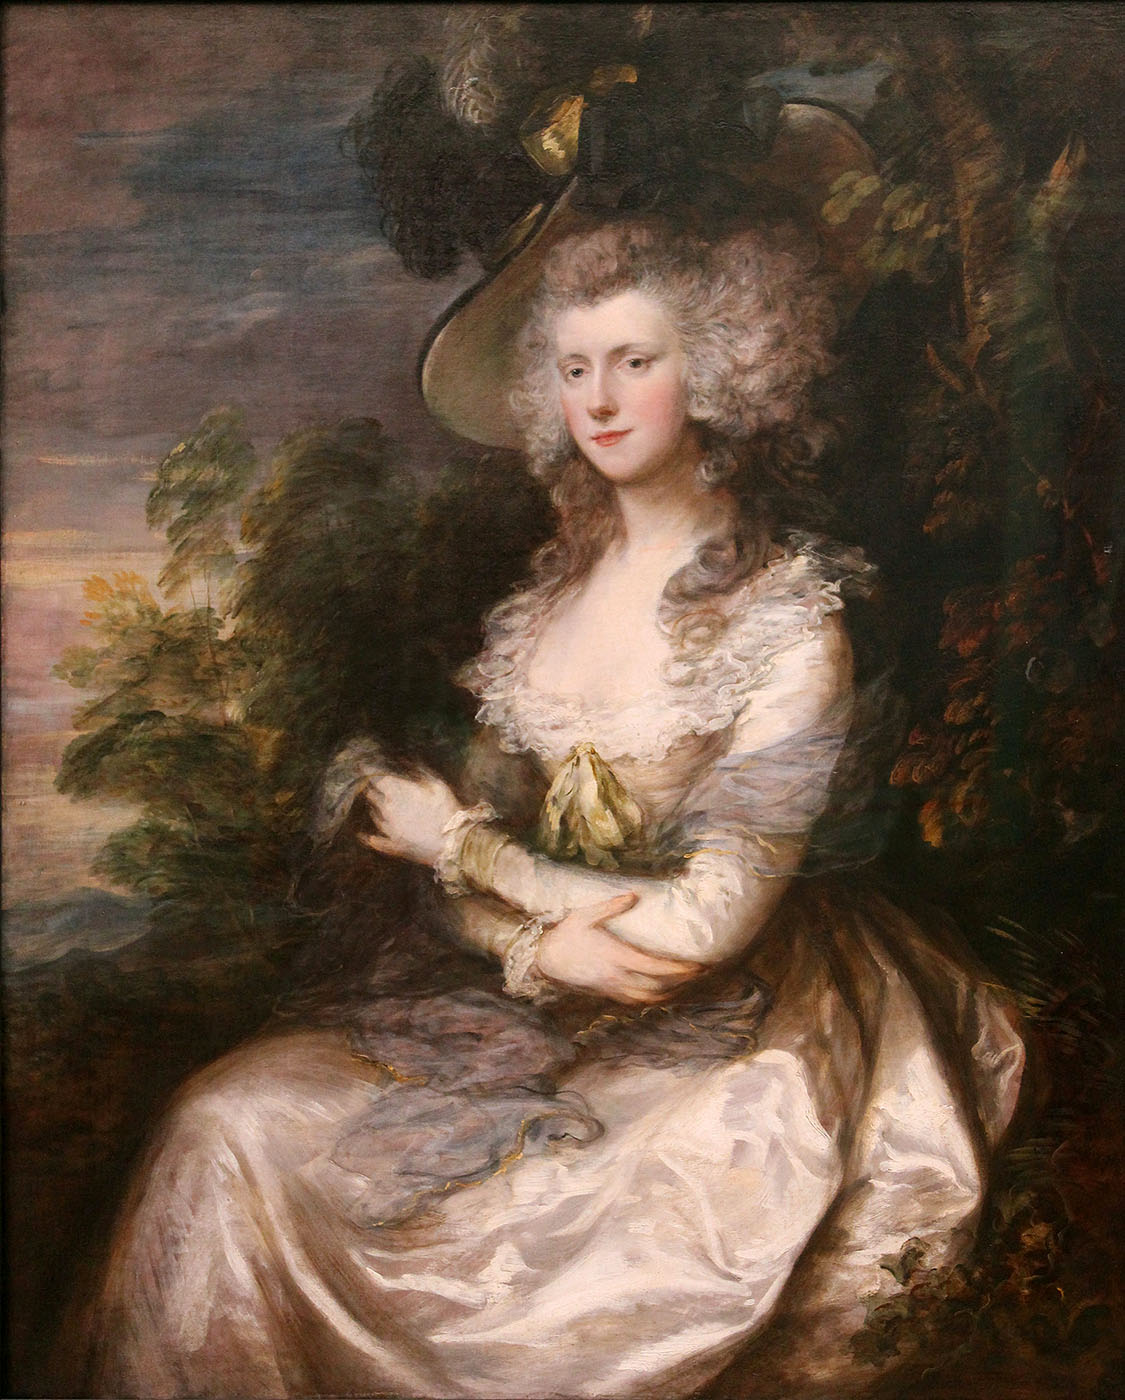 Thomas Gainsborough. Retrato de la señora Hibbert. 1786. Neue Pinakothek. Munich.